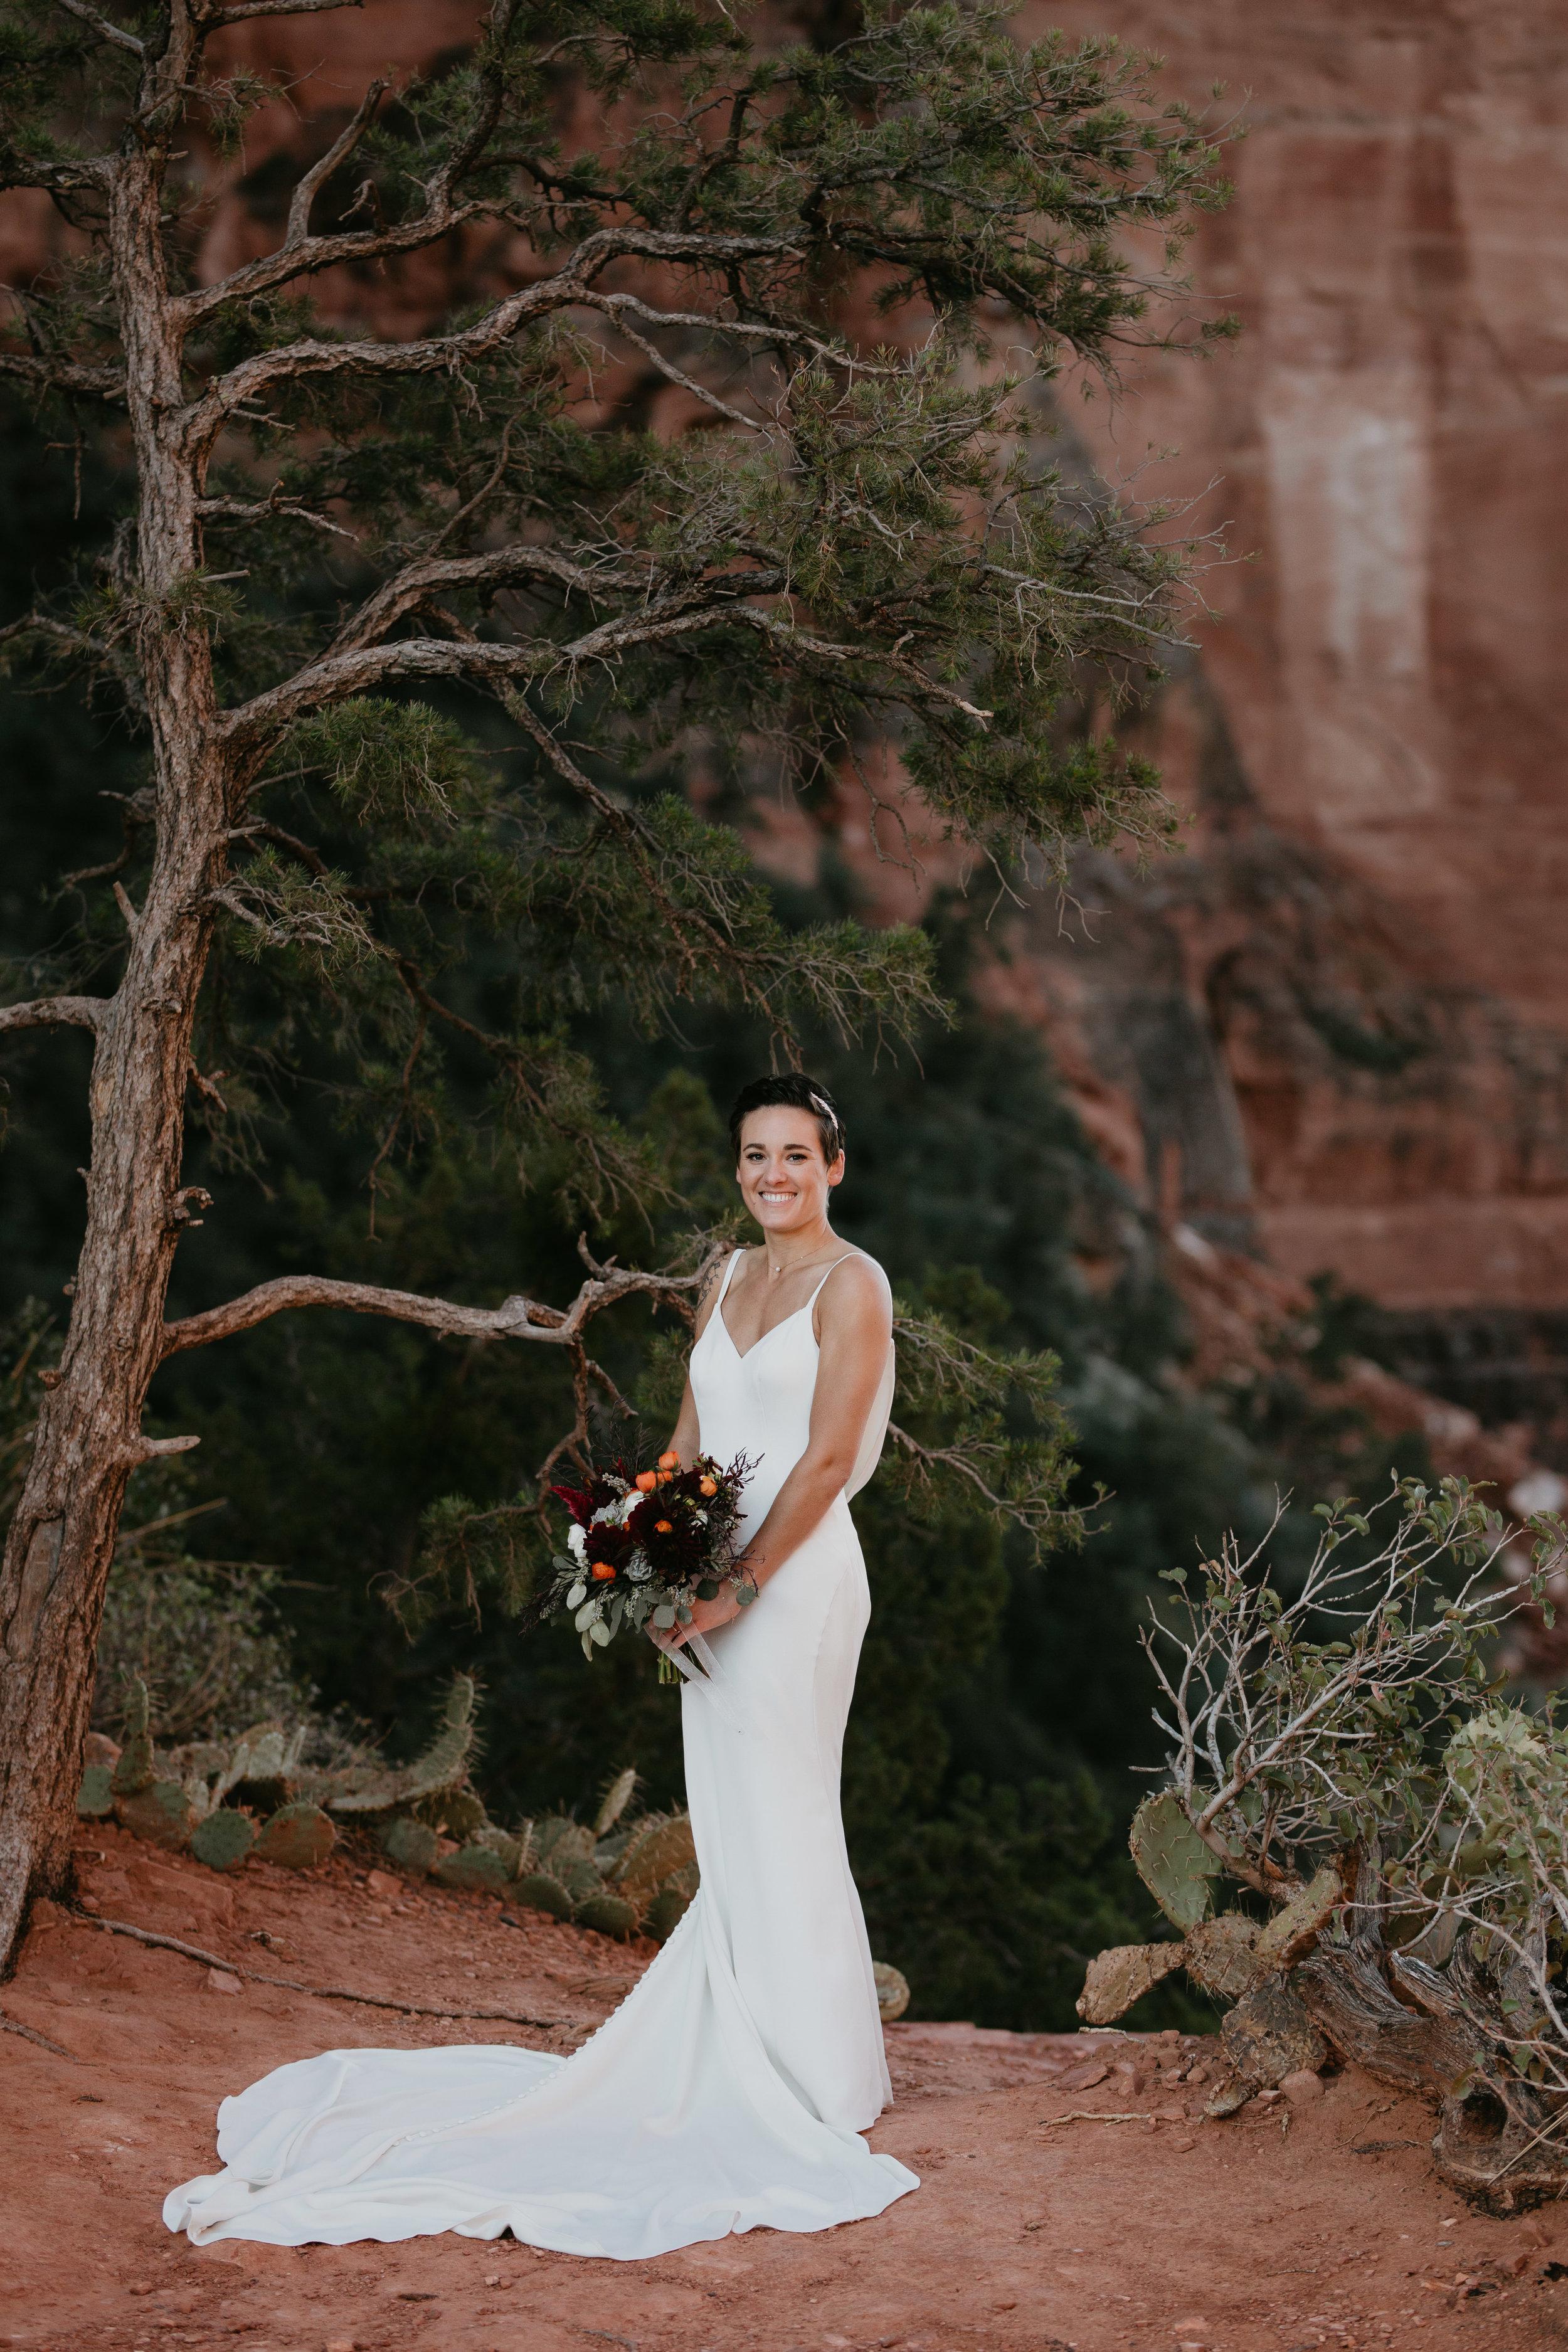 nicole-daacke-photography-sedona-arizona-destination-elopement-wedding-photographer-catherdral-rock-hiking-elopement-sedona-river-elopement-photos-desert-rock-wedding-photographer-laid-back-spontaneous-elopement-60.jpg